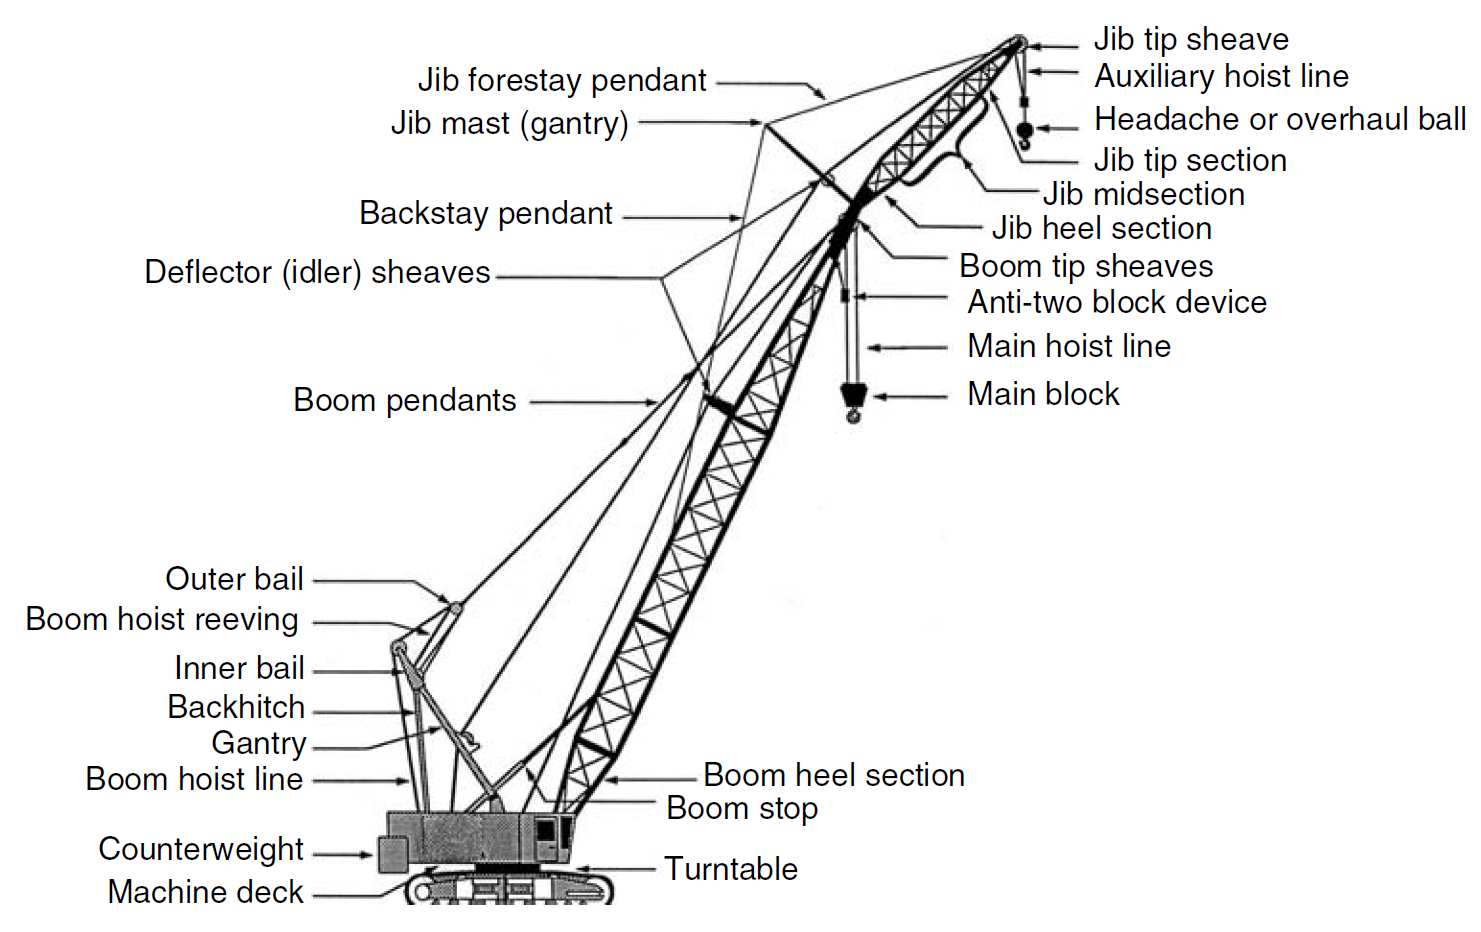 lattice boom crawler cranes engineersdaily free engineering database lattice boom crawler crane diagram lattice boom crawler crane diagram [ 1481 x 932 Pixel ]